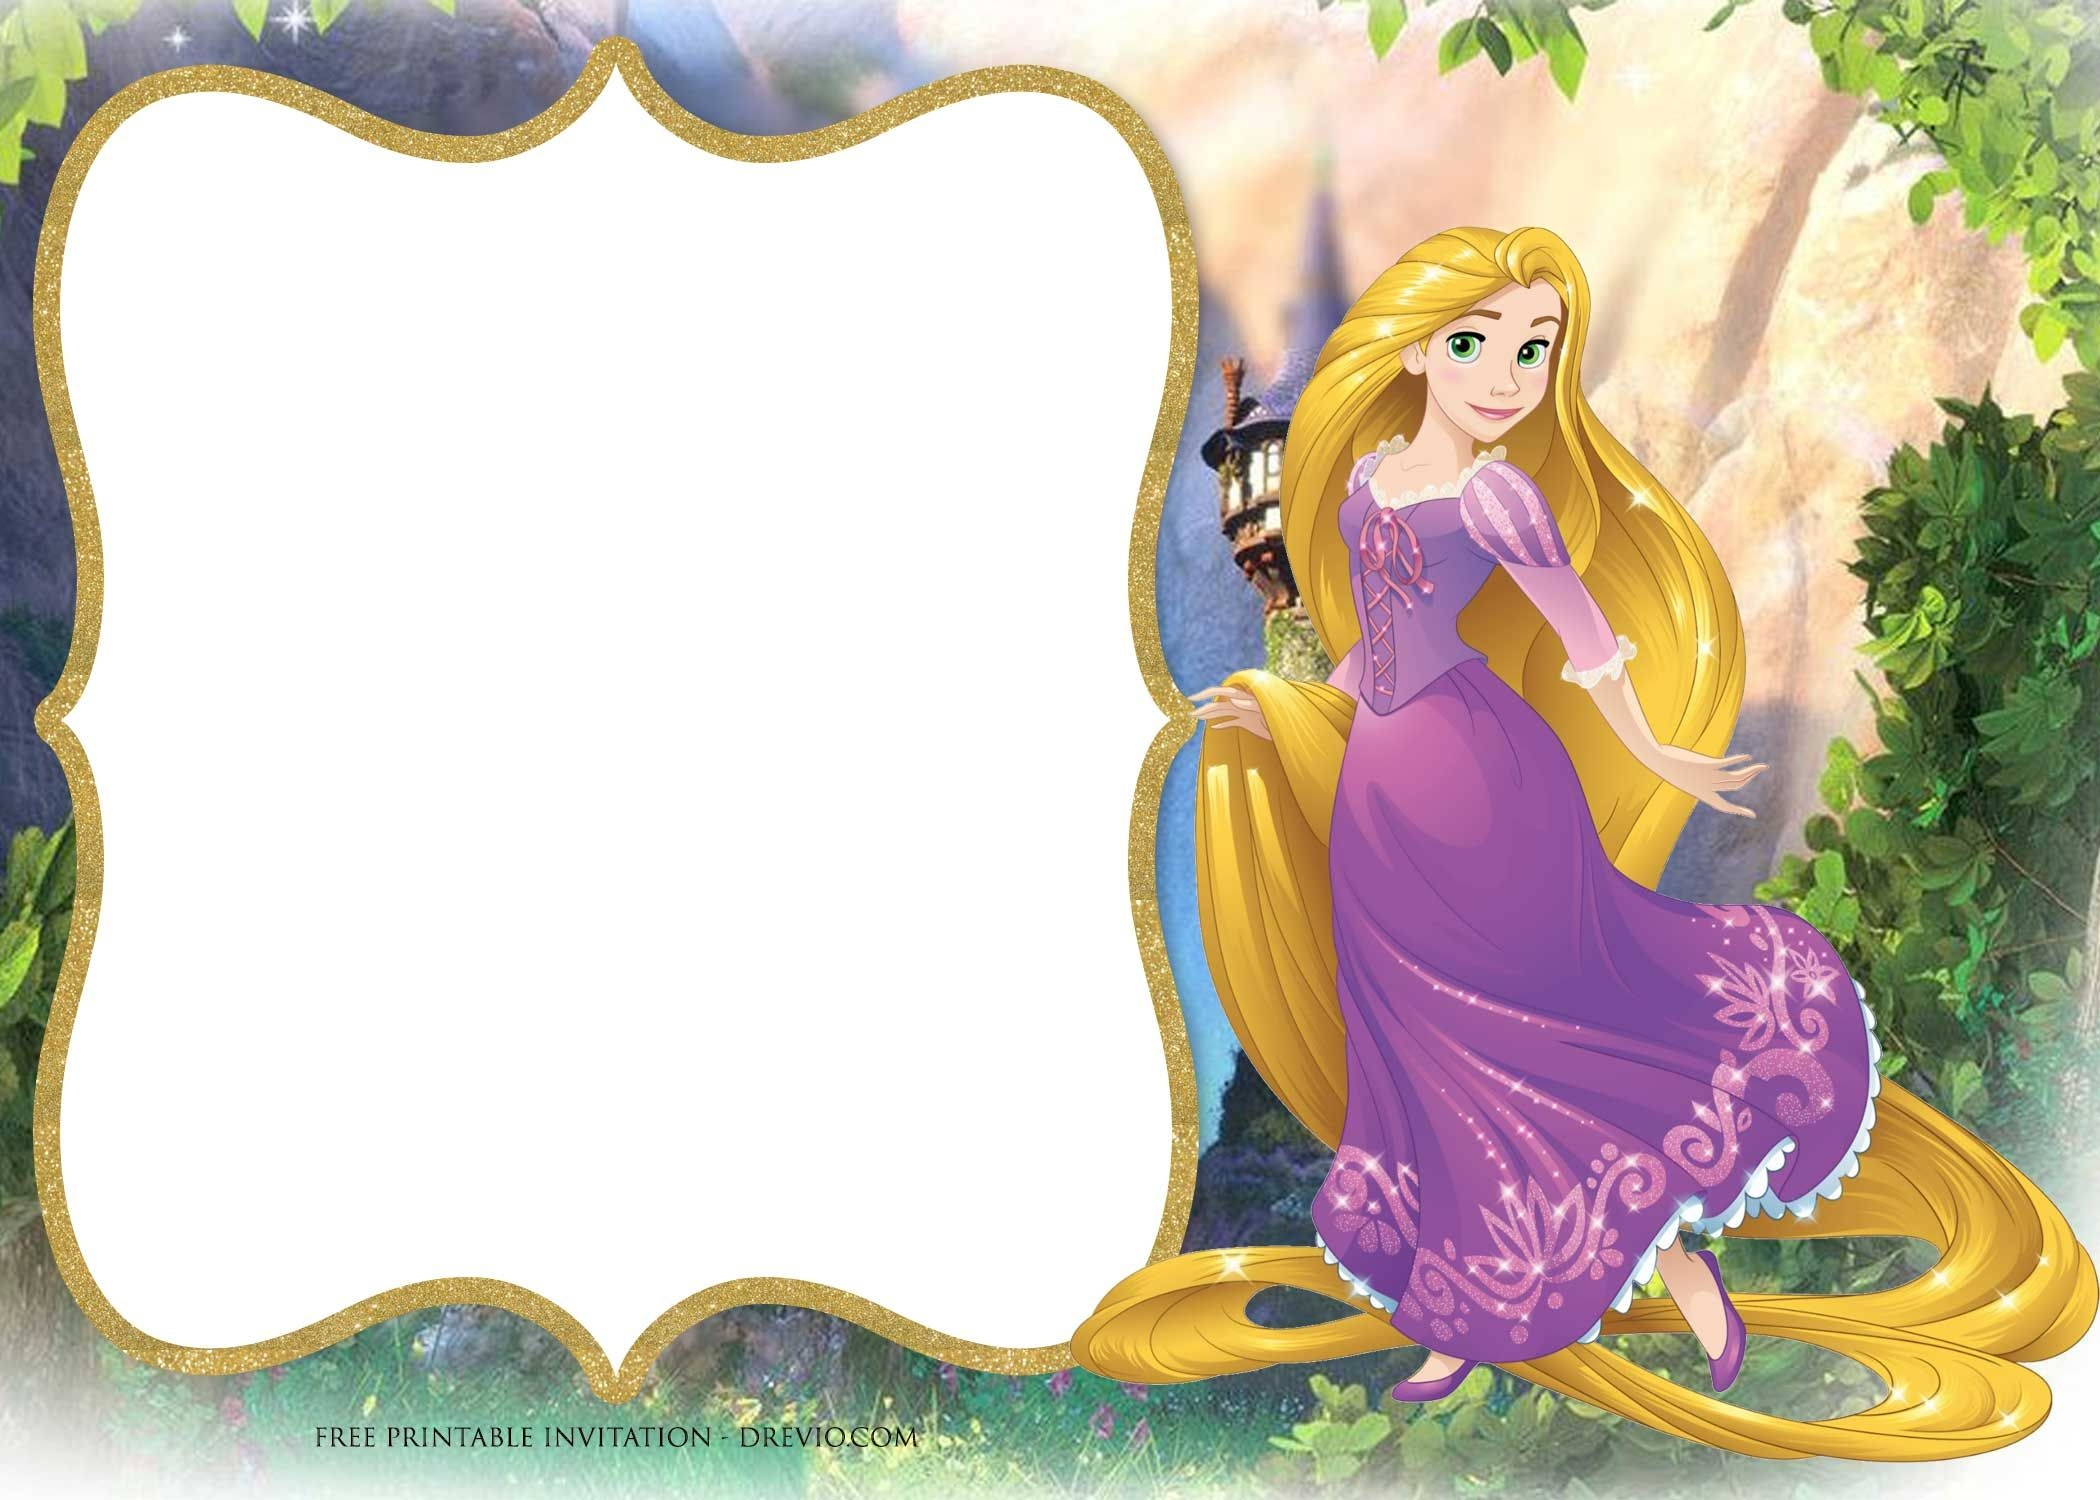 Free Printable Princess Rapunzel Invitation Templates | Free - Free Printable Tangled